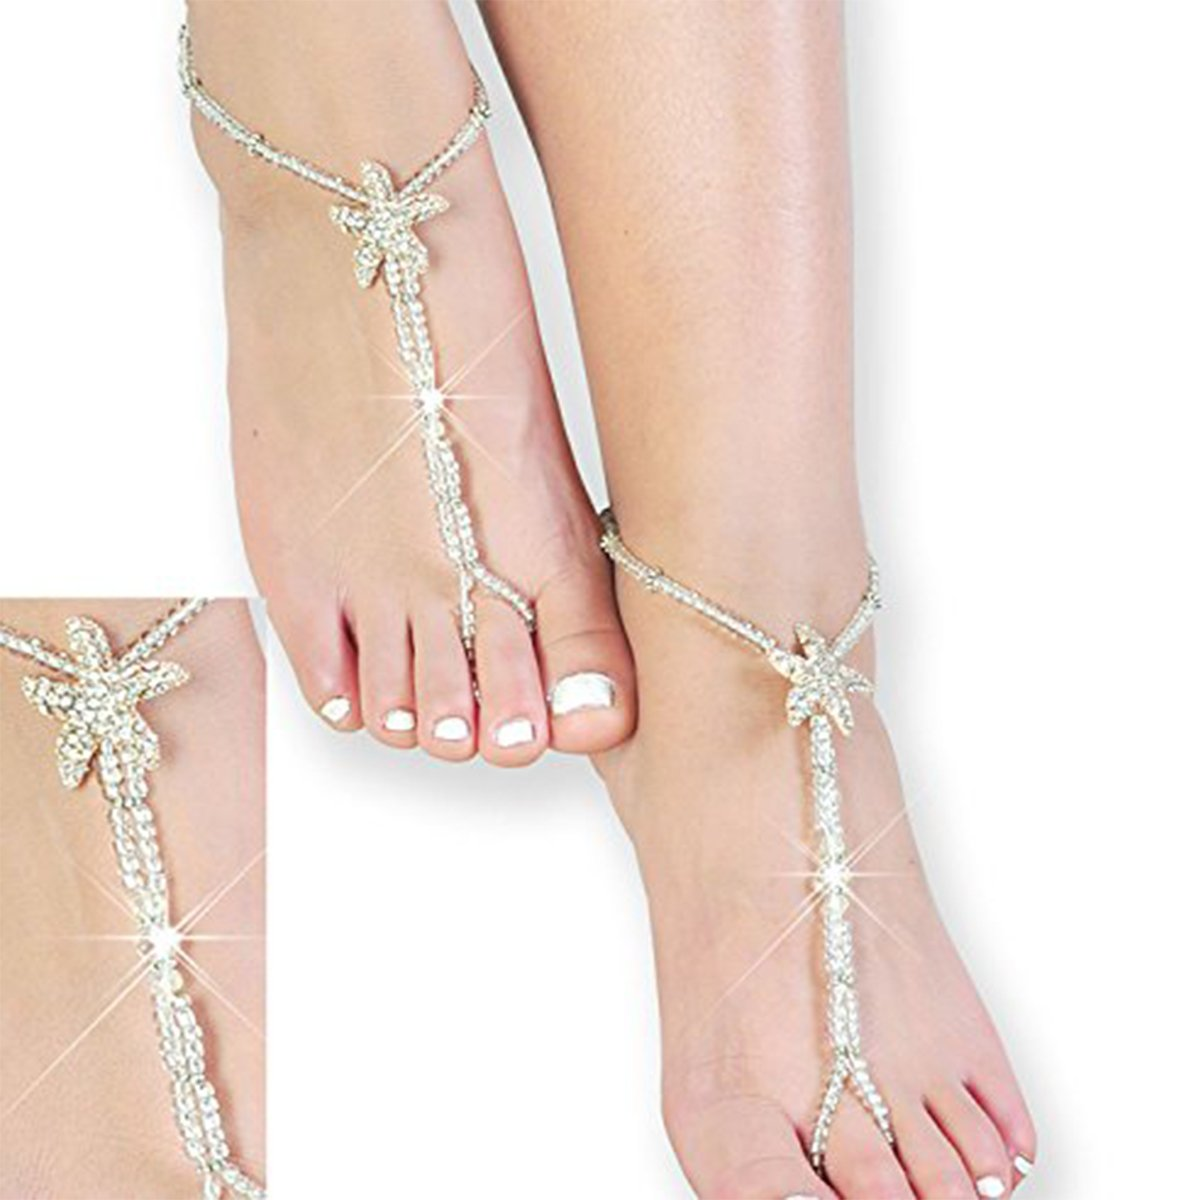 Beaded Bridal Barefoot Sandals,Wedding Anklet,Crystal Sandals,Bridesmaid Gift